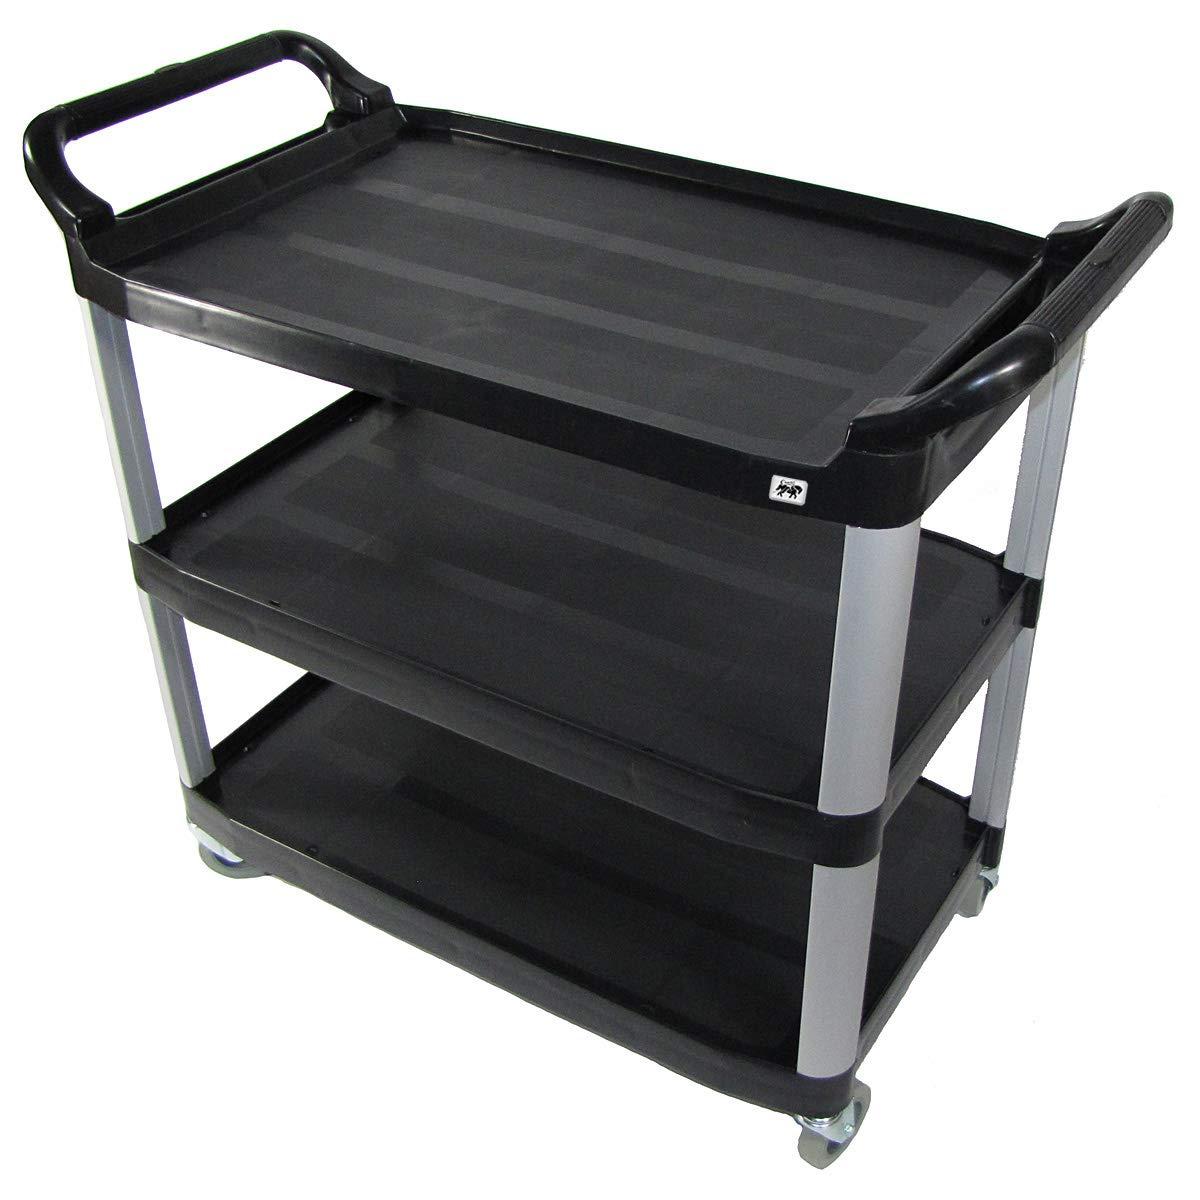 Crayata 3 Shelf Rolling Utility Cart with Heavy Duty Plastic Shelves and Custom Oversized 4 Inch Wheels, 400 Pound Weight Capacity, Black (Large)